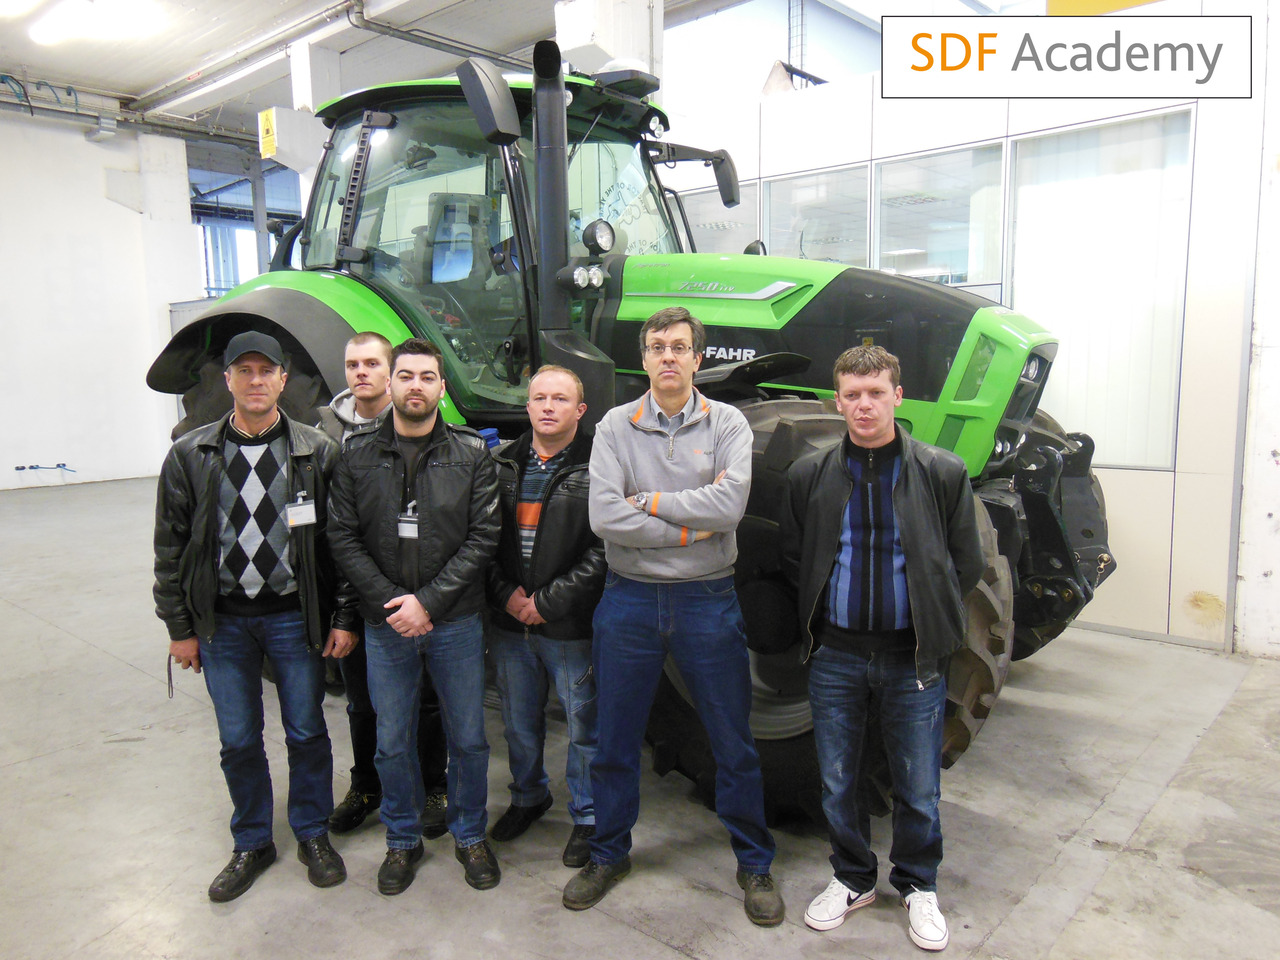 SDF Academy - Corso con tecnici rumeni